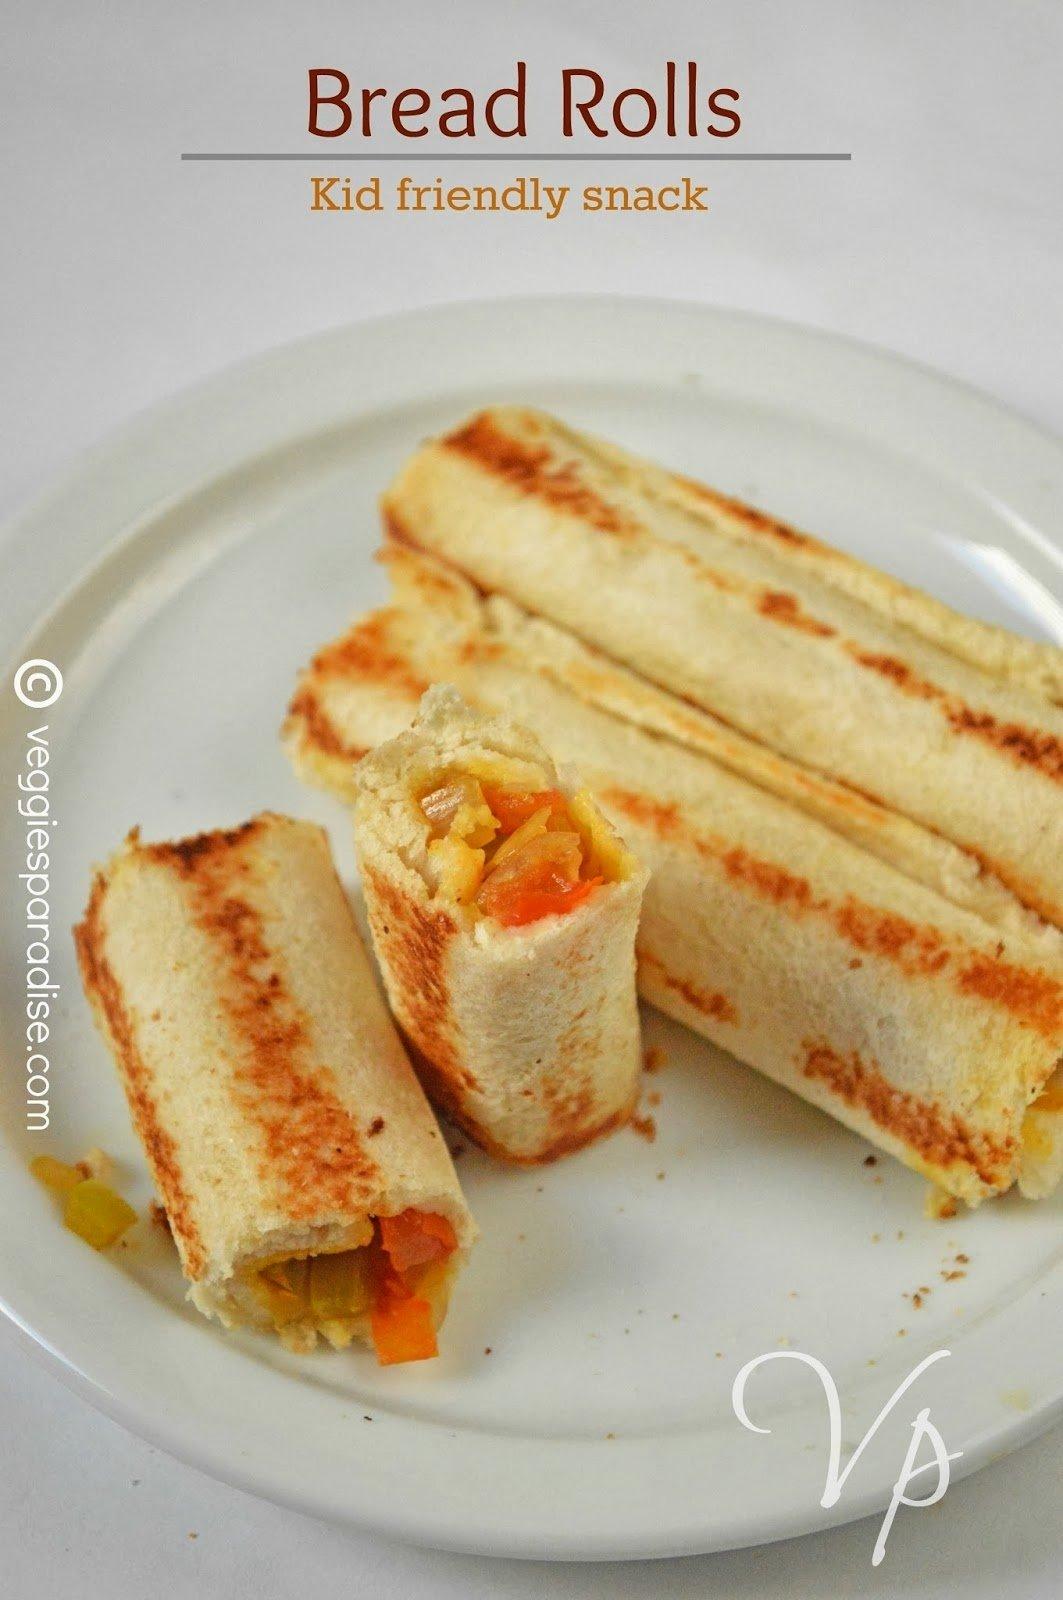 10 Famous Easy Snack Ideas For Kids bread rolls easy kids snacks pictorial video veggies paradise 2020